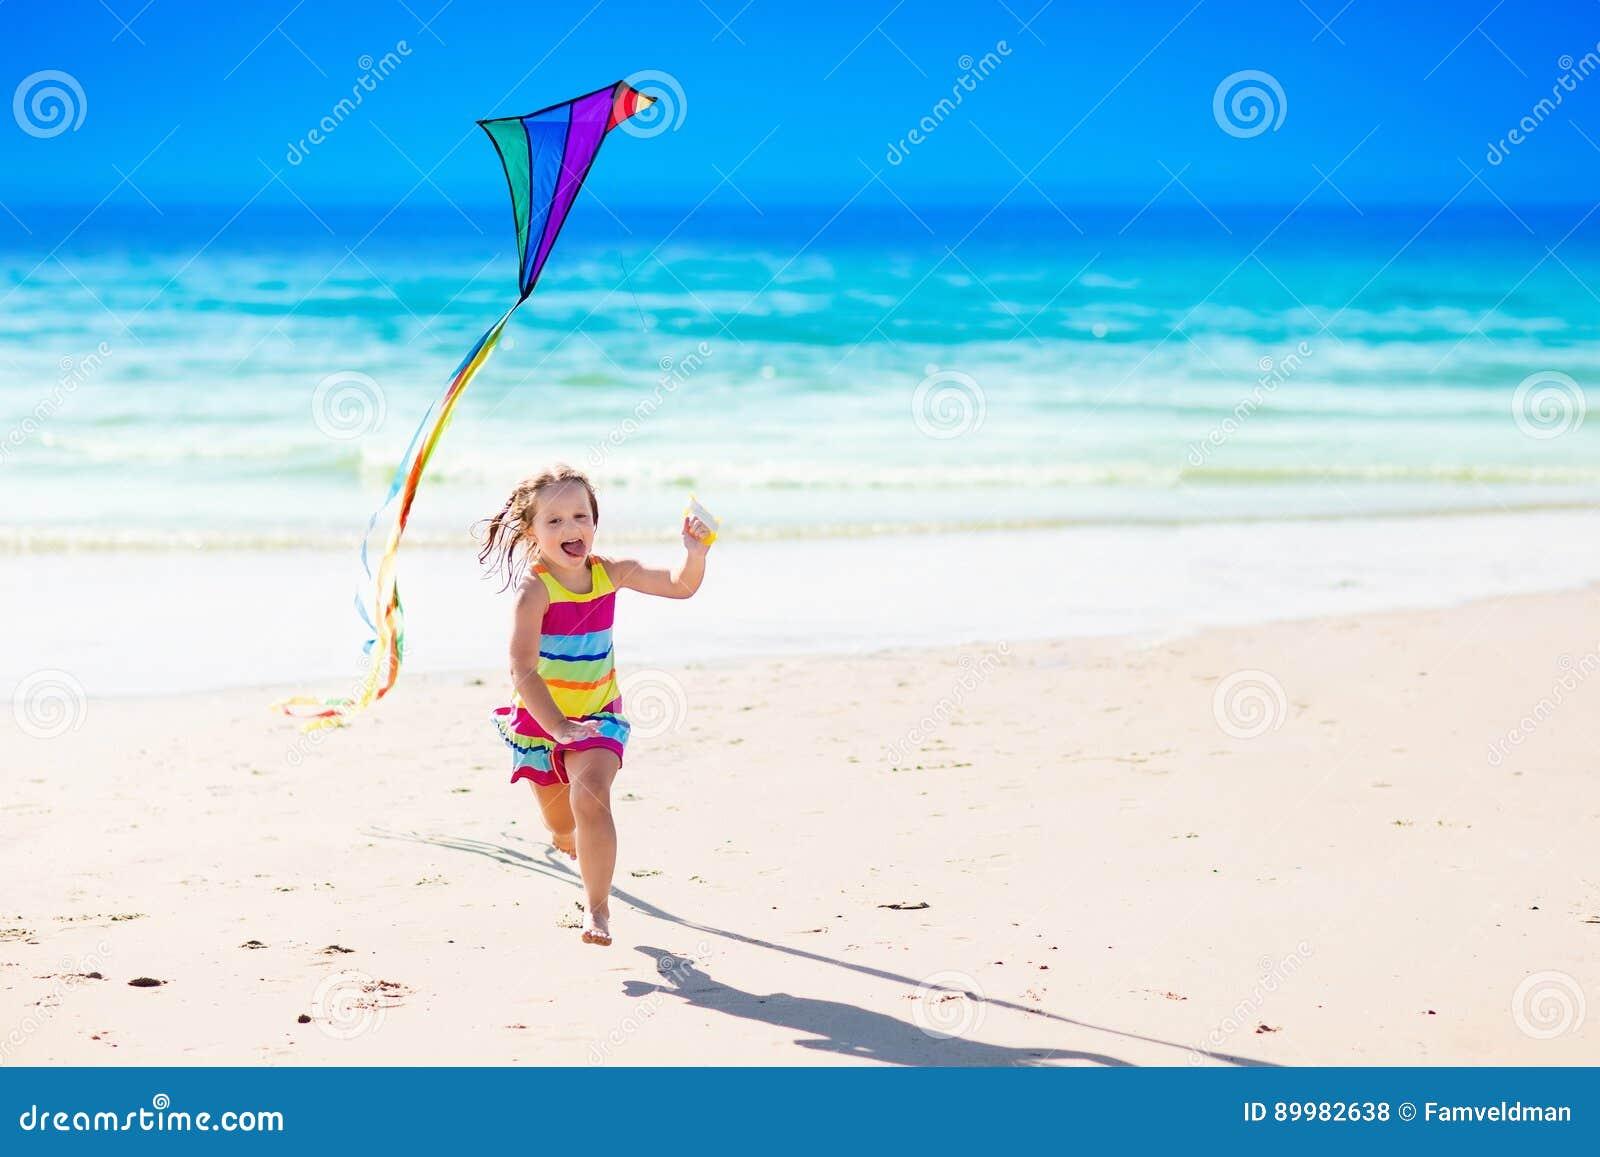 Kind vliegende vlieger op tropisch strand